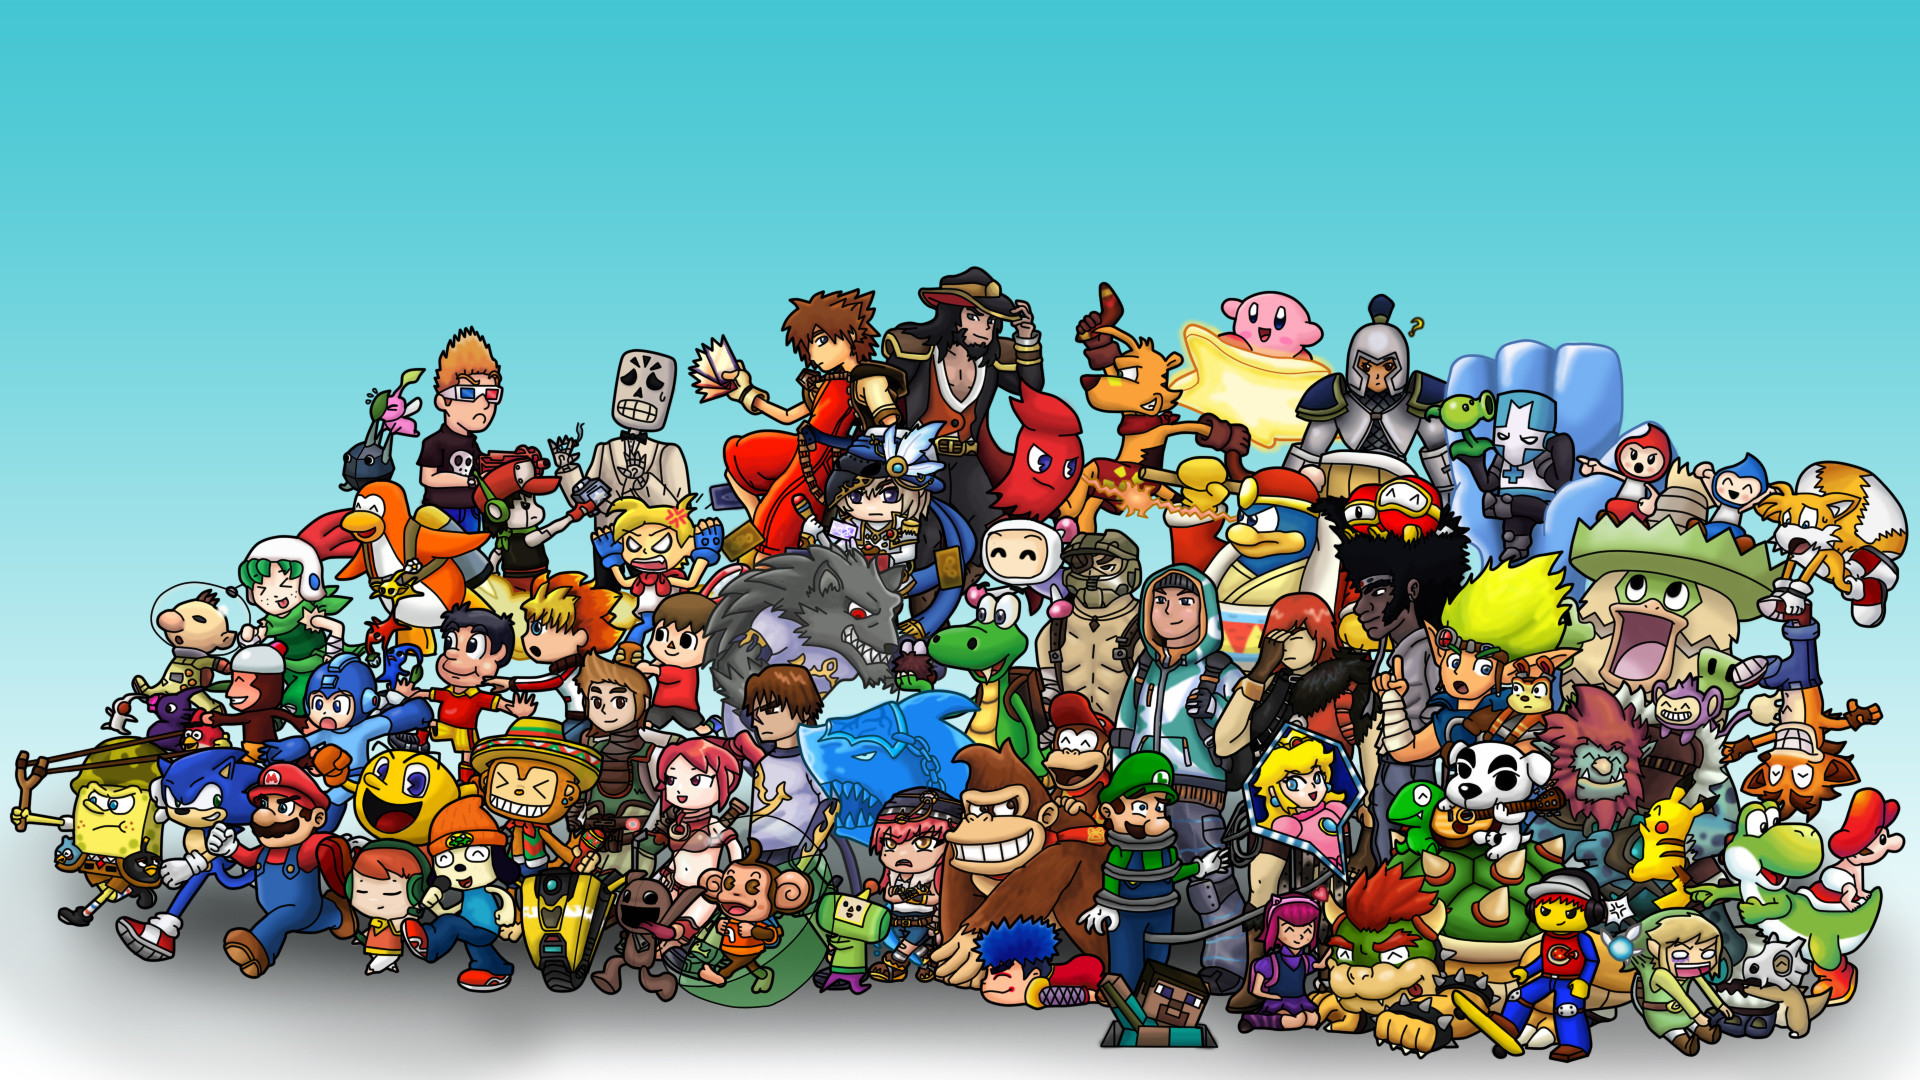 video game wallpaper great name by obubblesmansion fan art wallpaper .